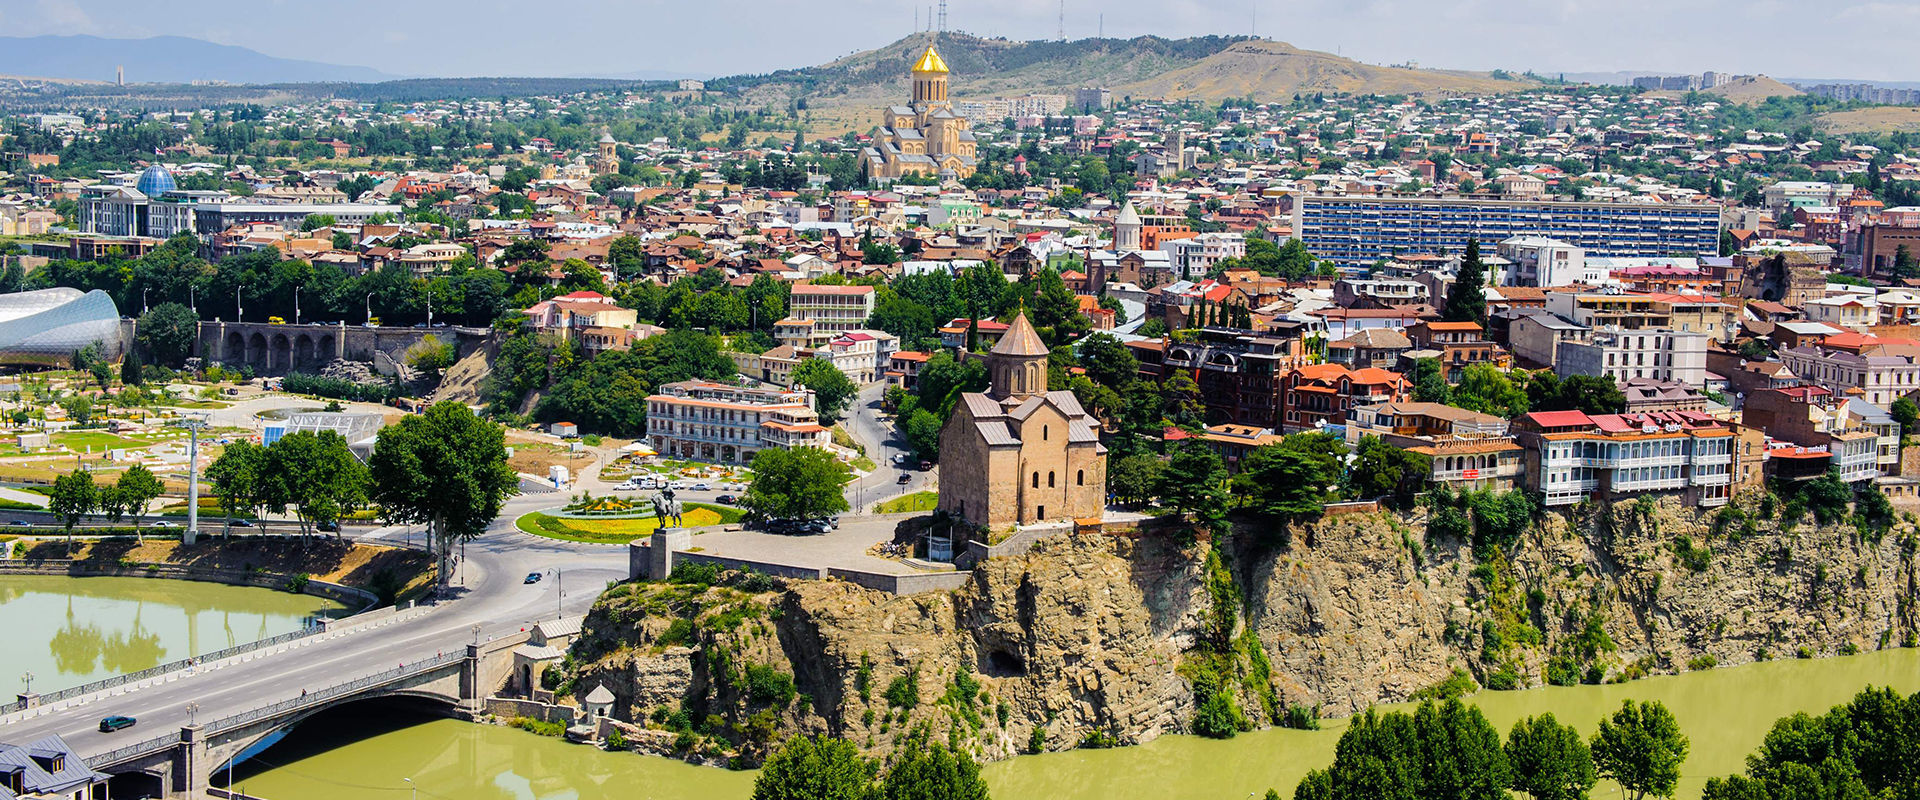 ¿A qué país pertenece Tbilisi/Tiflis?